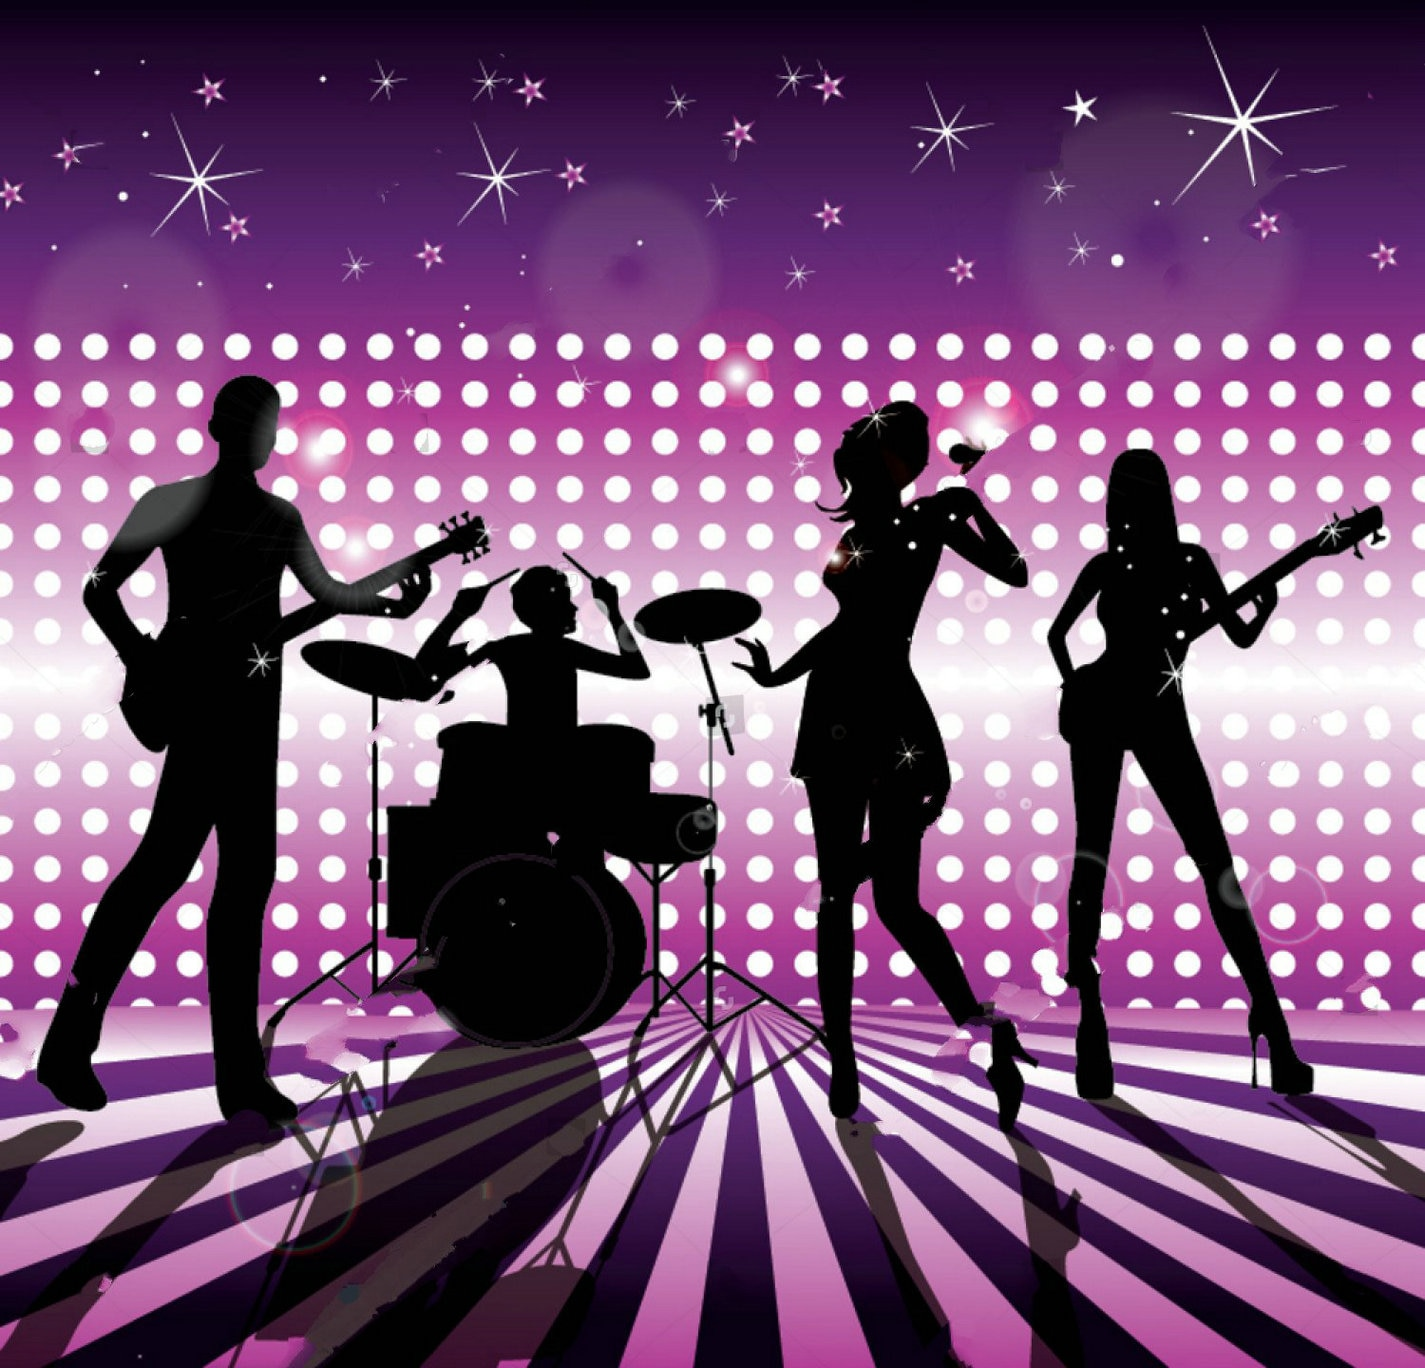 Rock Star Band DJ Stage Sparkly Polka Dot disco foto telón de fondo de alta calidad impreso por ordenador fiesta de fondo